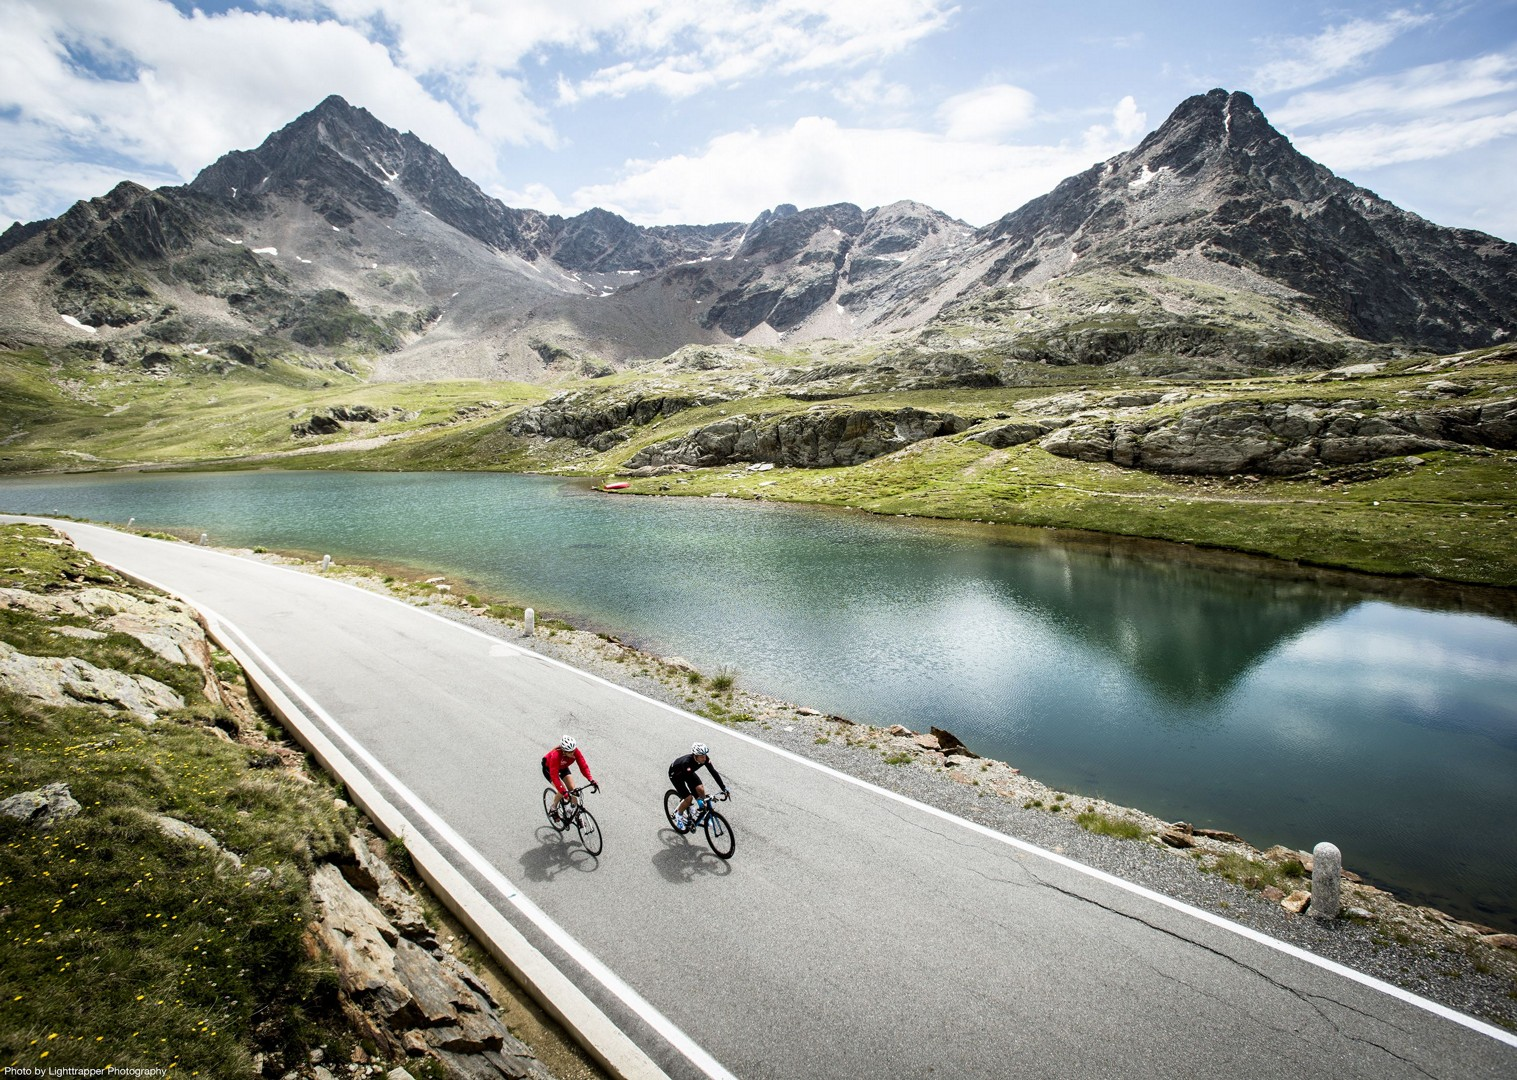 gavia-guided-road-cycling-holiday.jpg - Italy - Italian Alps - Guided Road Cycling Holiday - Road Cycling